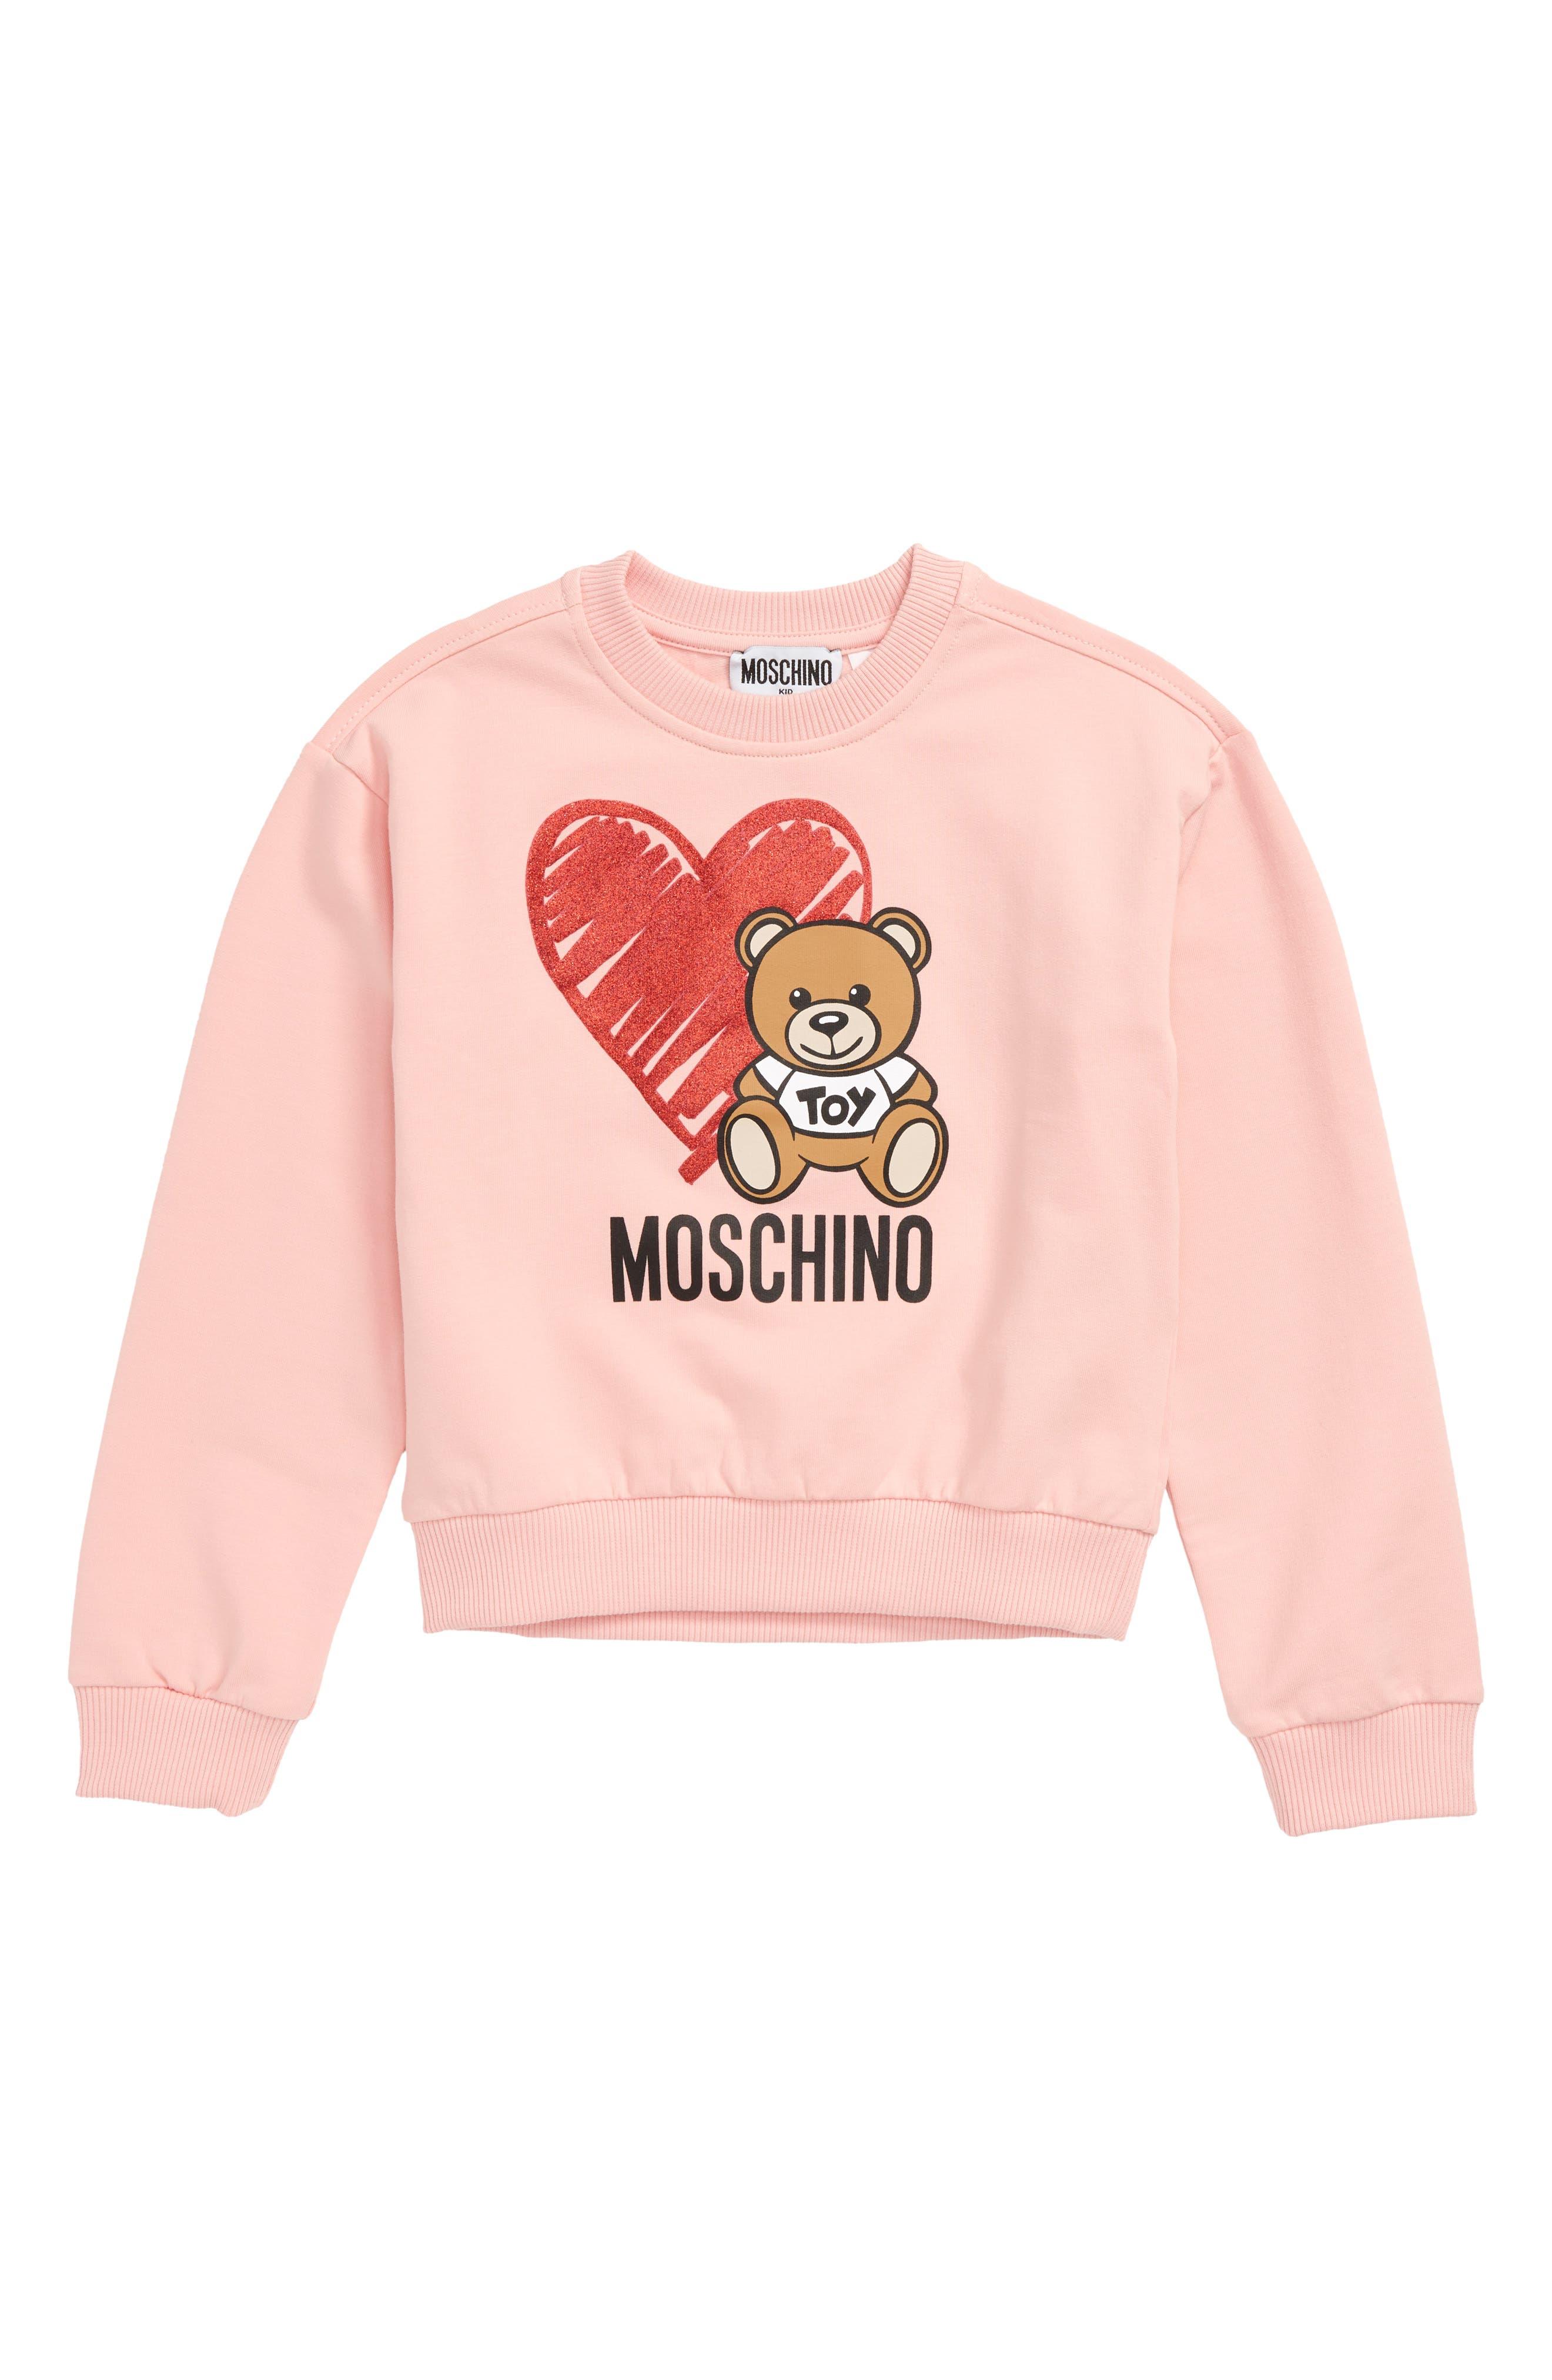 Girls Moschino Heart Logo Sweatshirt Size 4Y  Pink